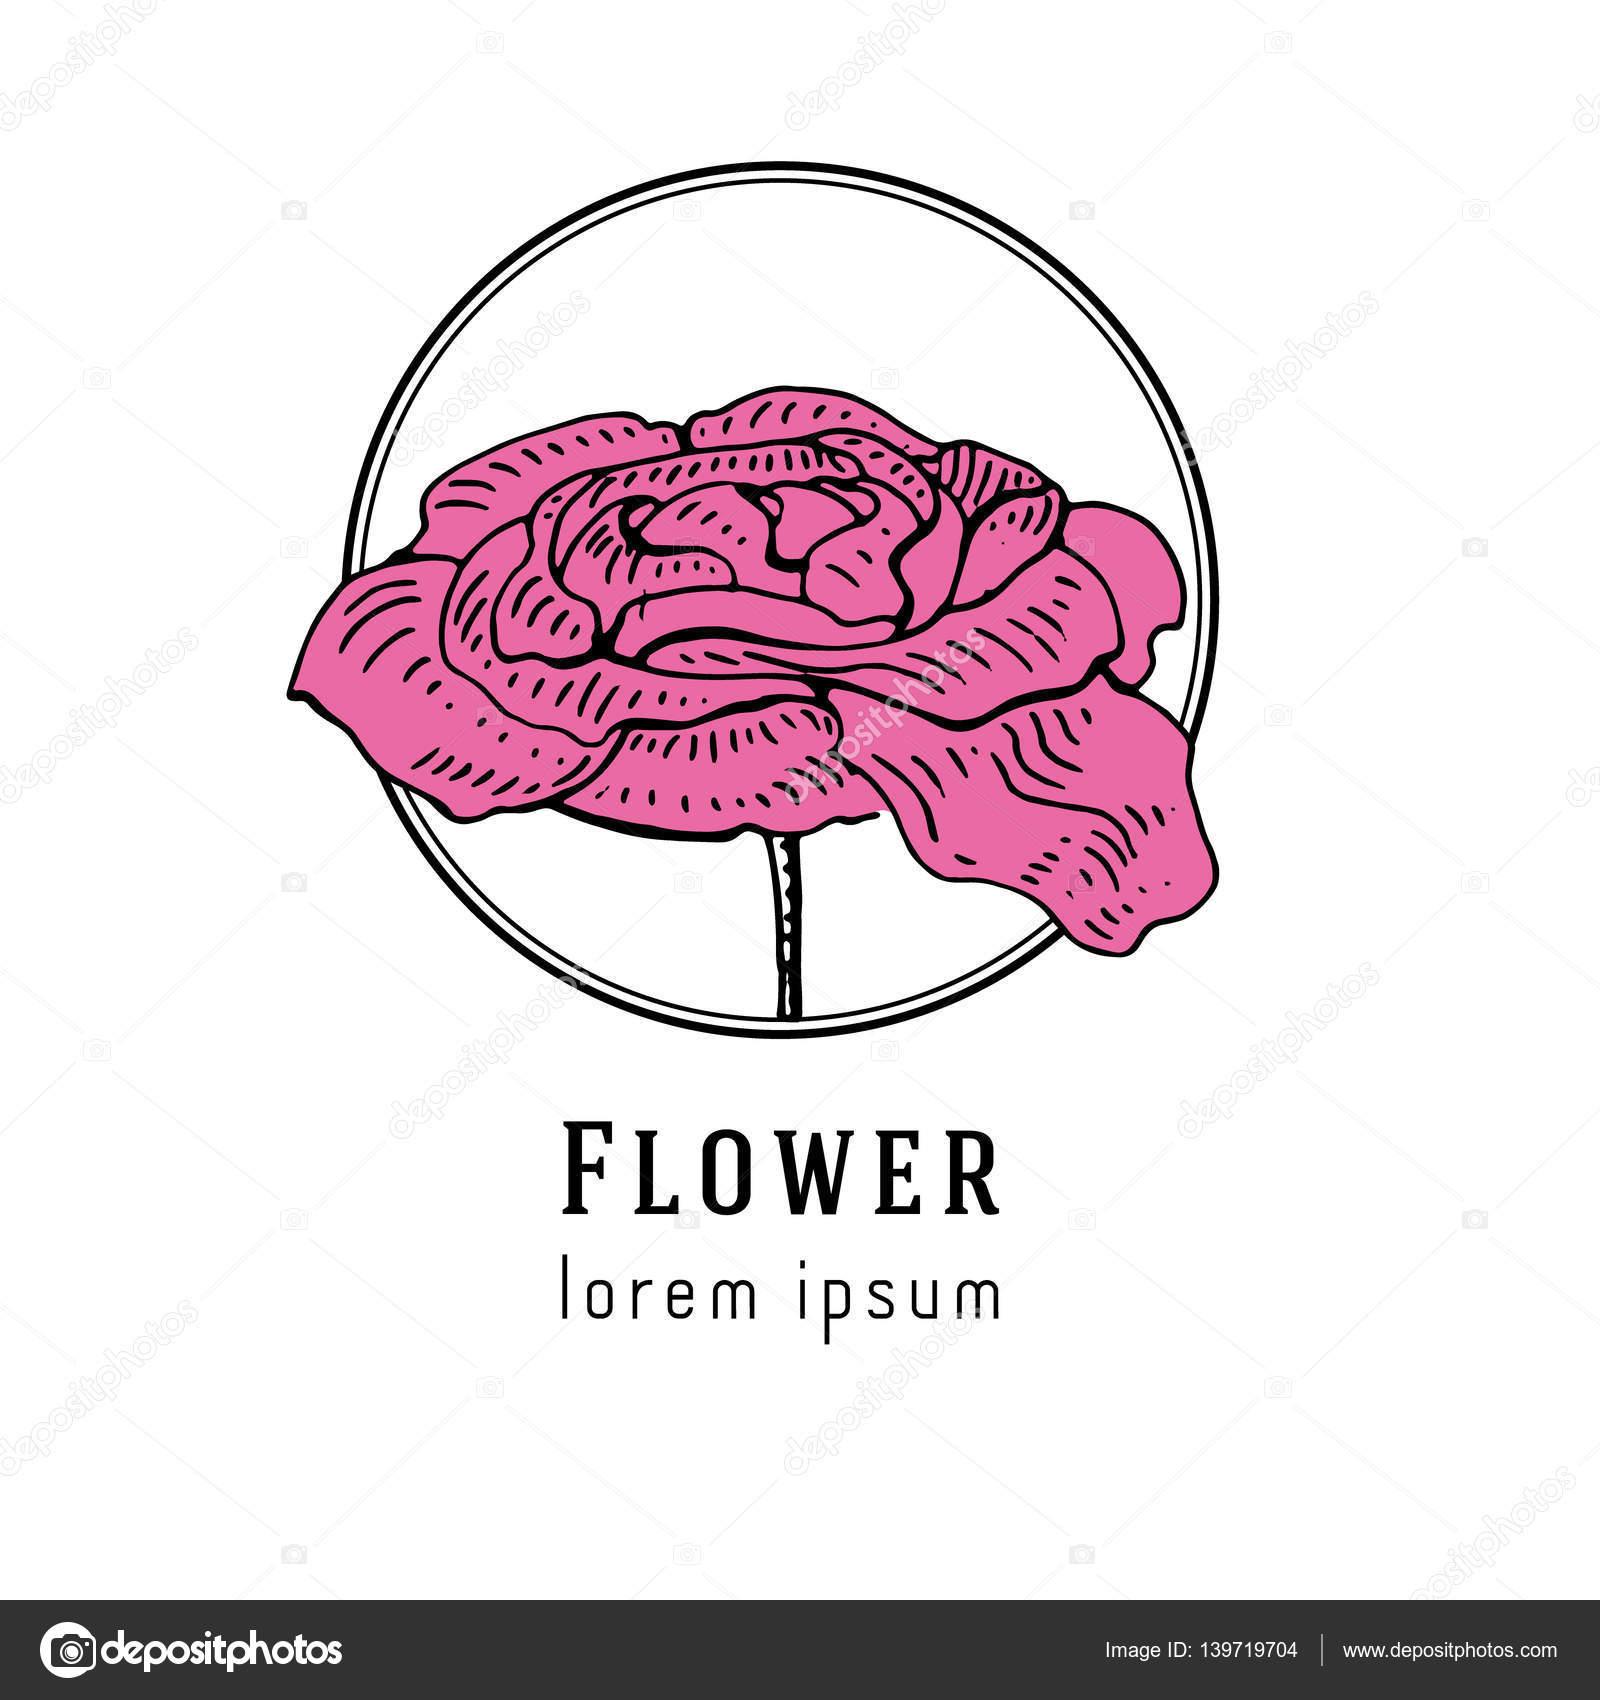 Peony Flower Logo Hand Drawn Peony Flower Logo Stock Vector C Chipurkolubov Rambler Ru 139719704